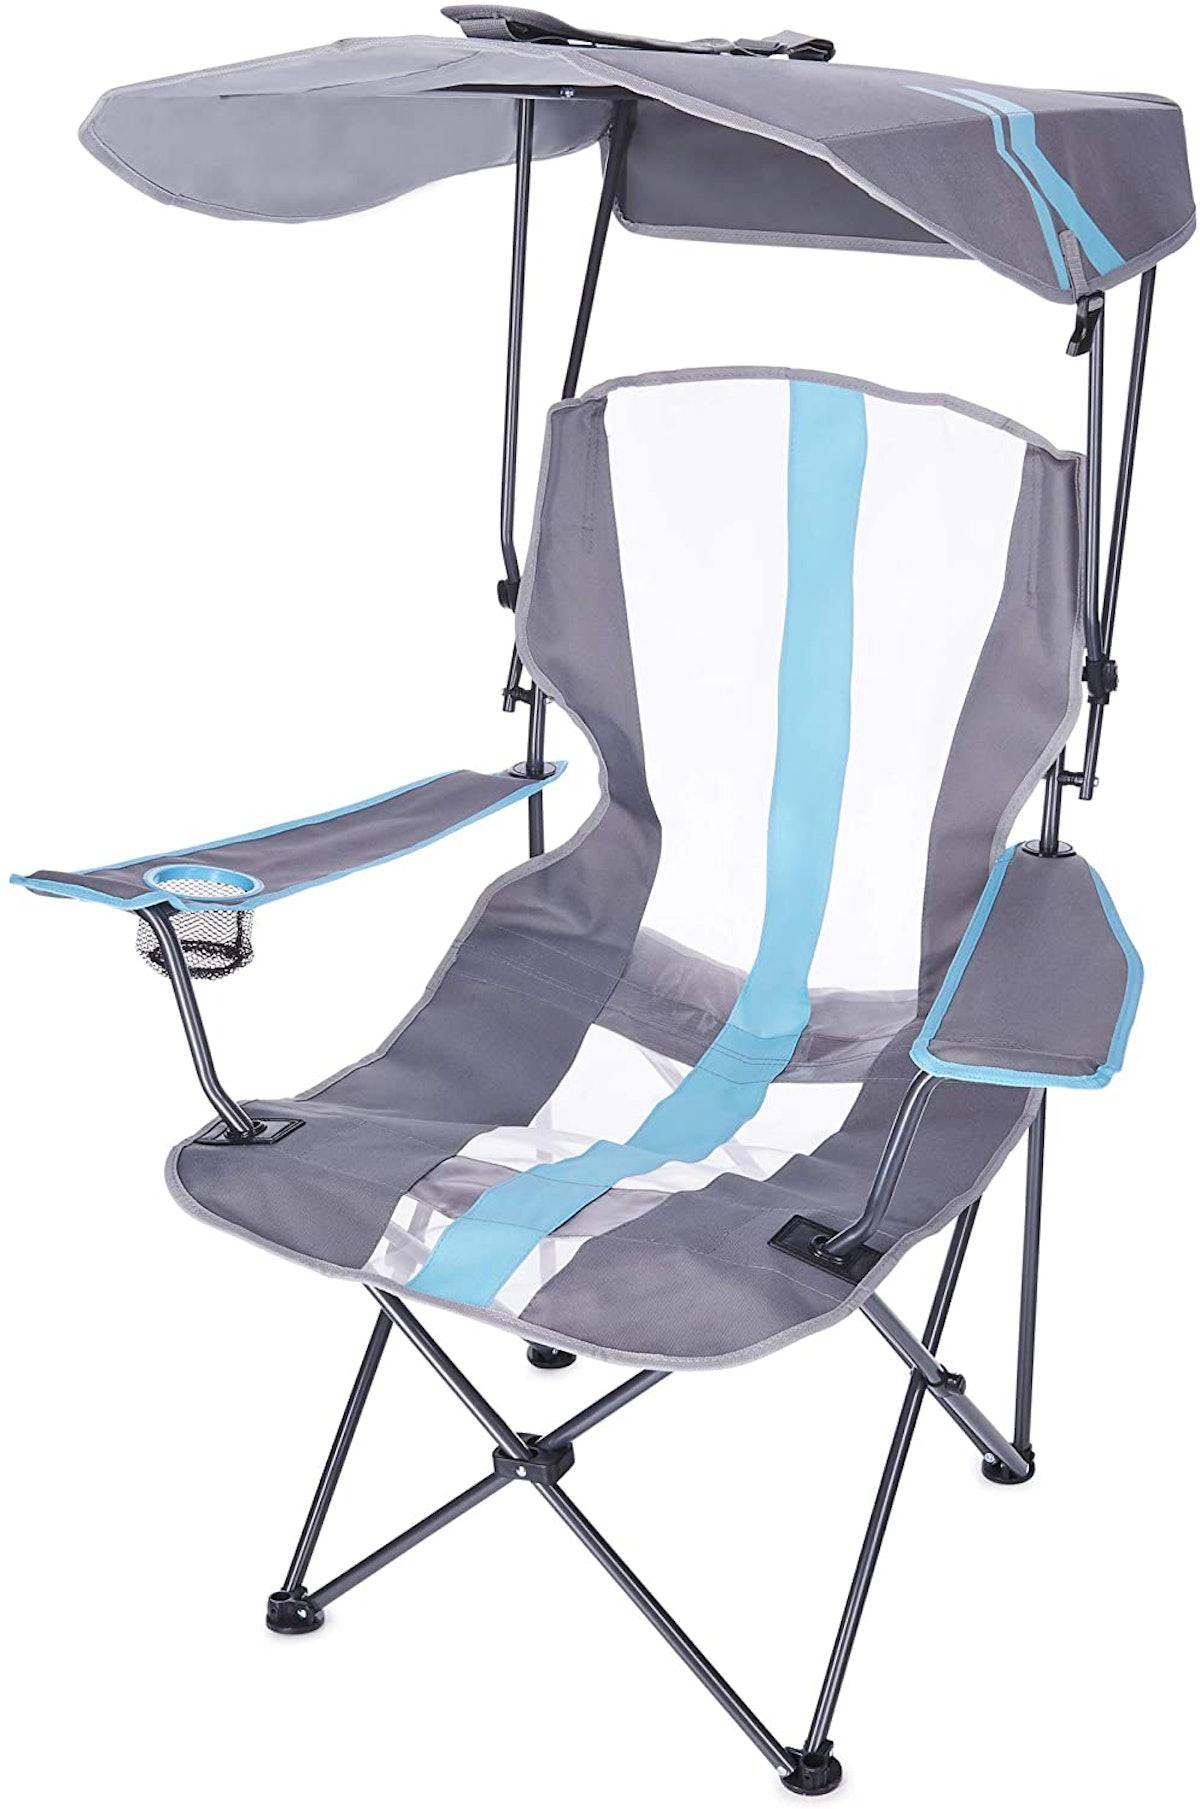 Kelsyus Original Canopy Chair